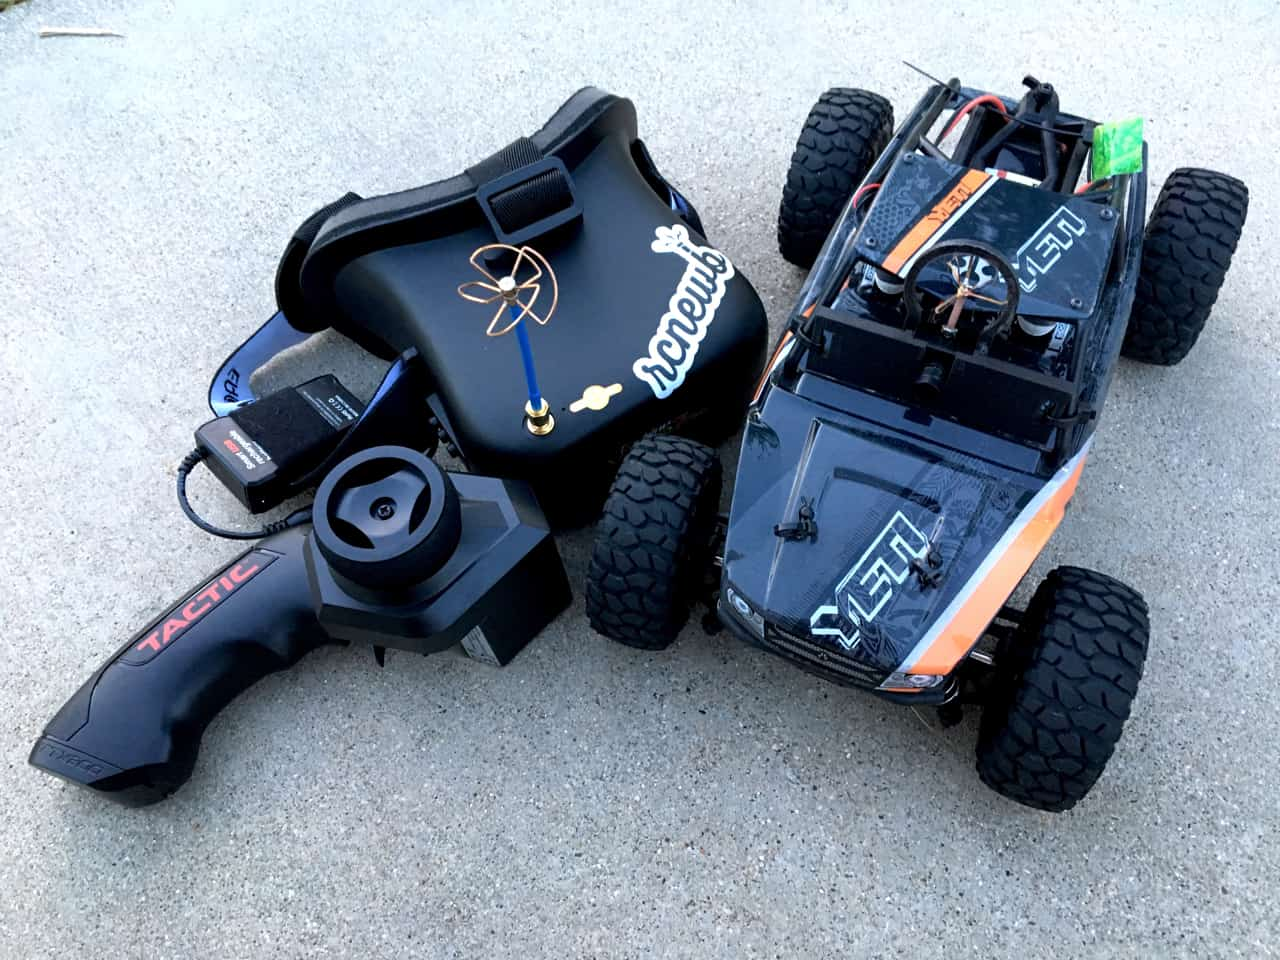 FPV Camera Setup - Axial Yeti Jr. Rock Racer